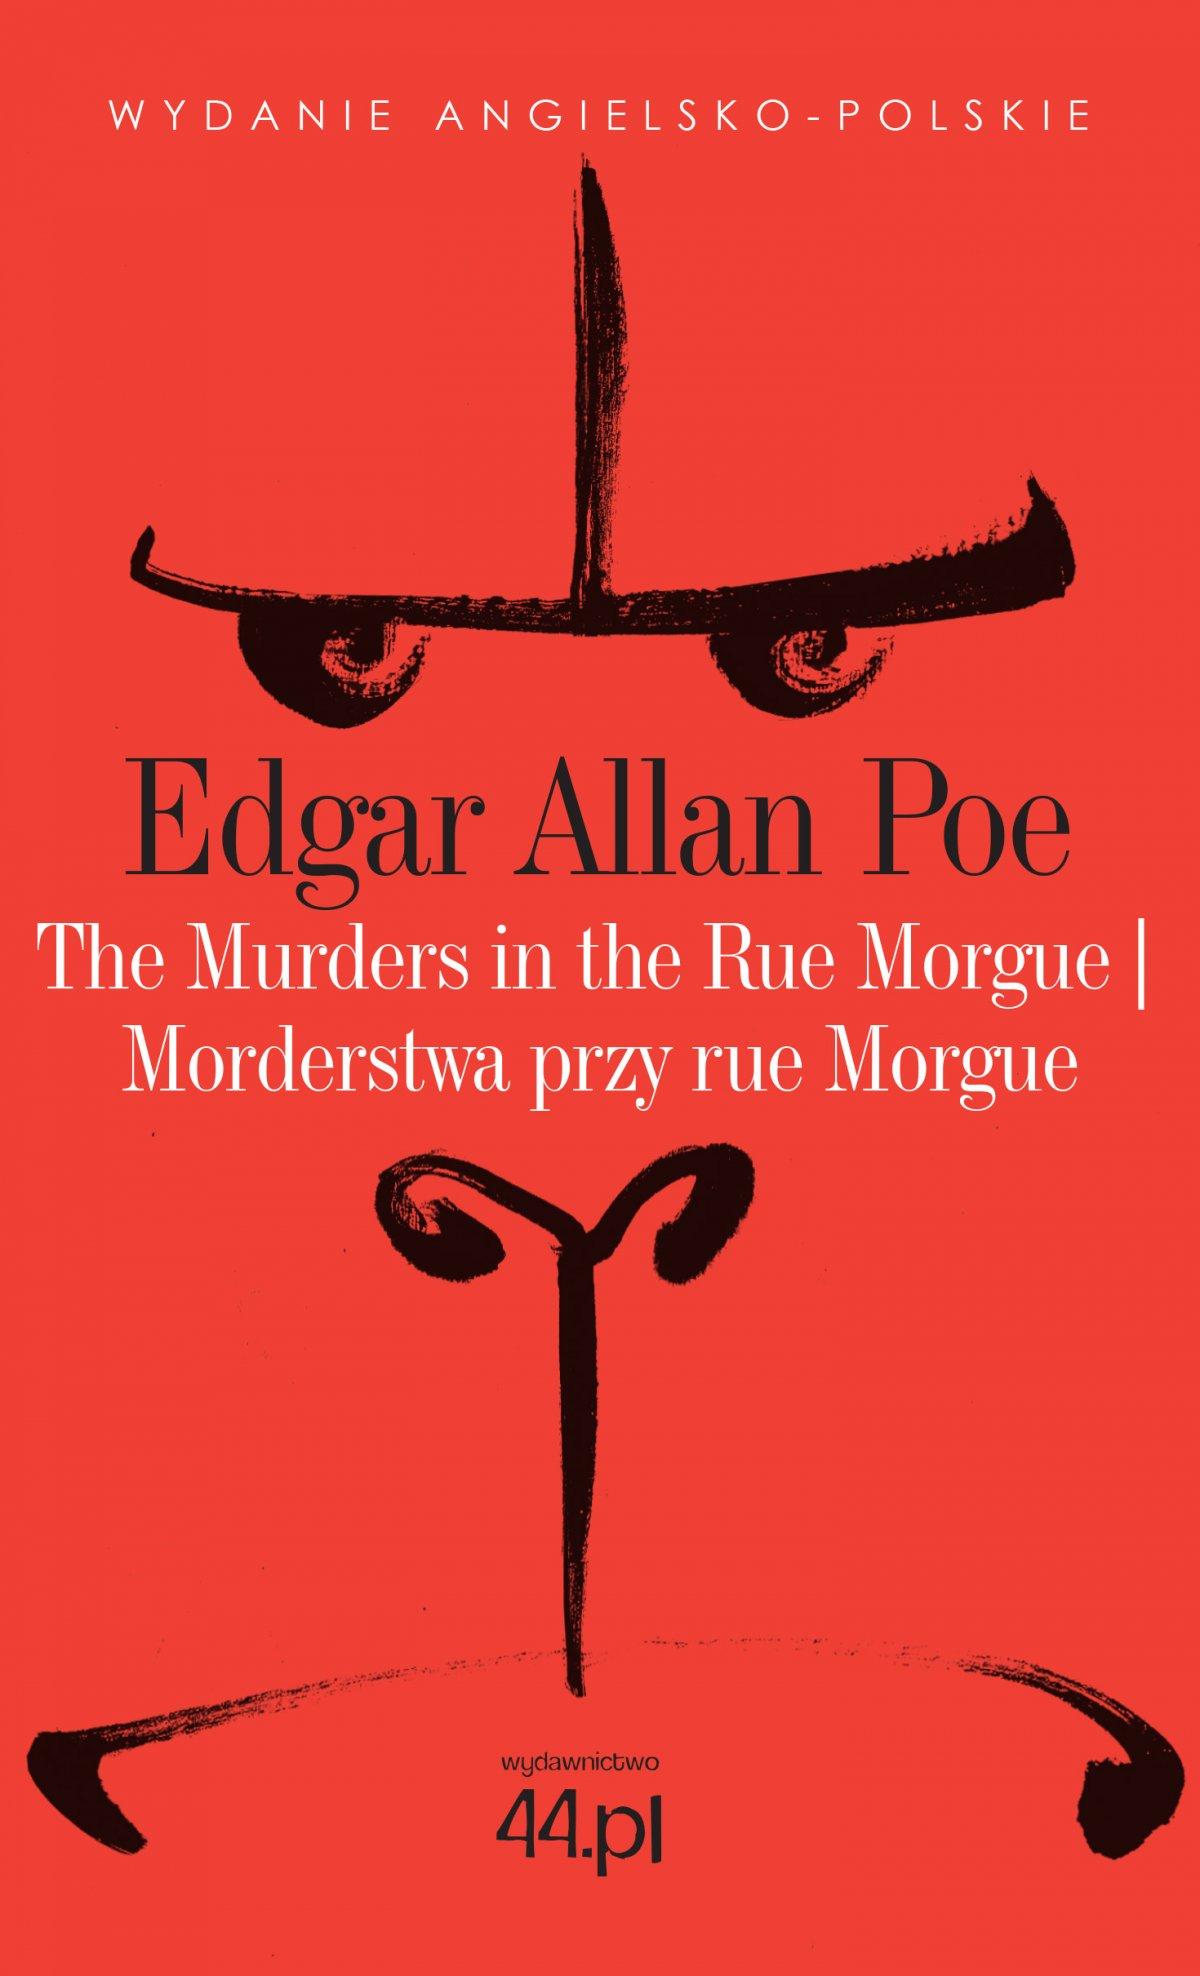 The Murders in the Rue Morgue. Morderstwa przy rue Morgue - Ebook (Książka EPUB) do pobrania w formacie EPUB